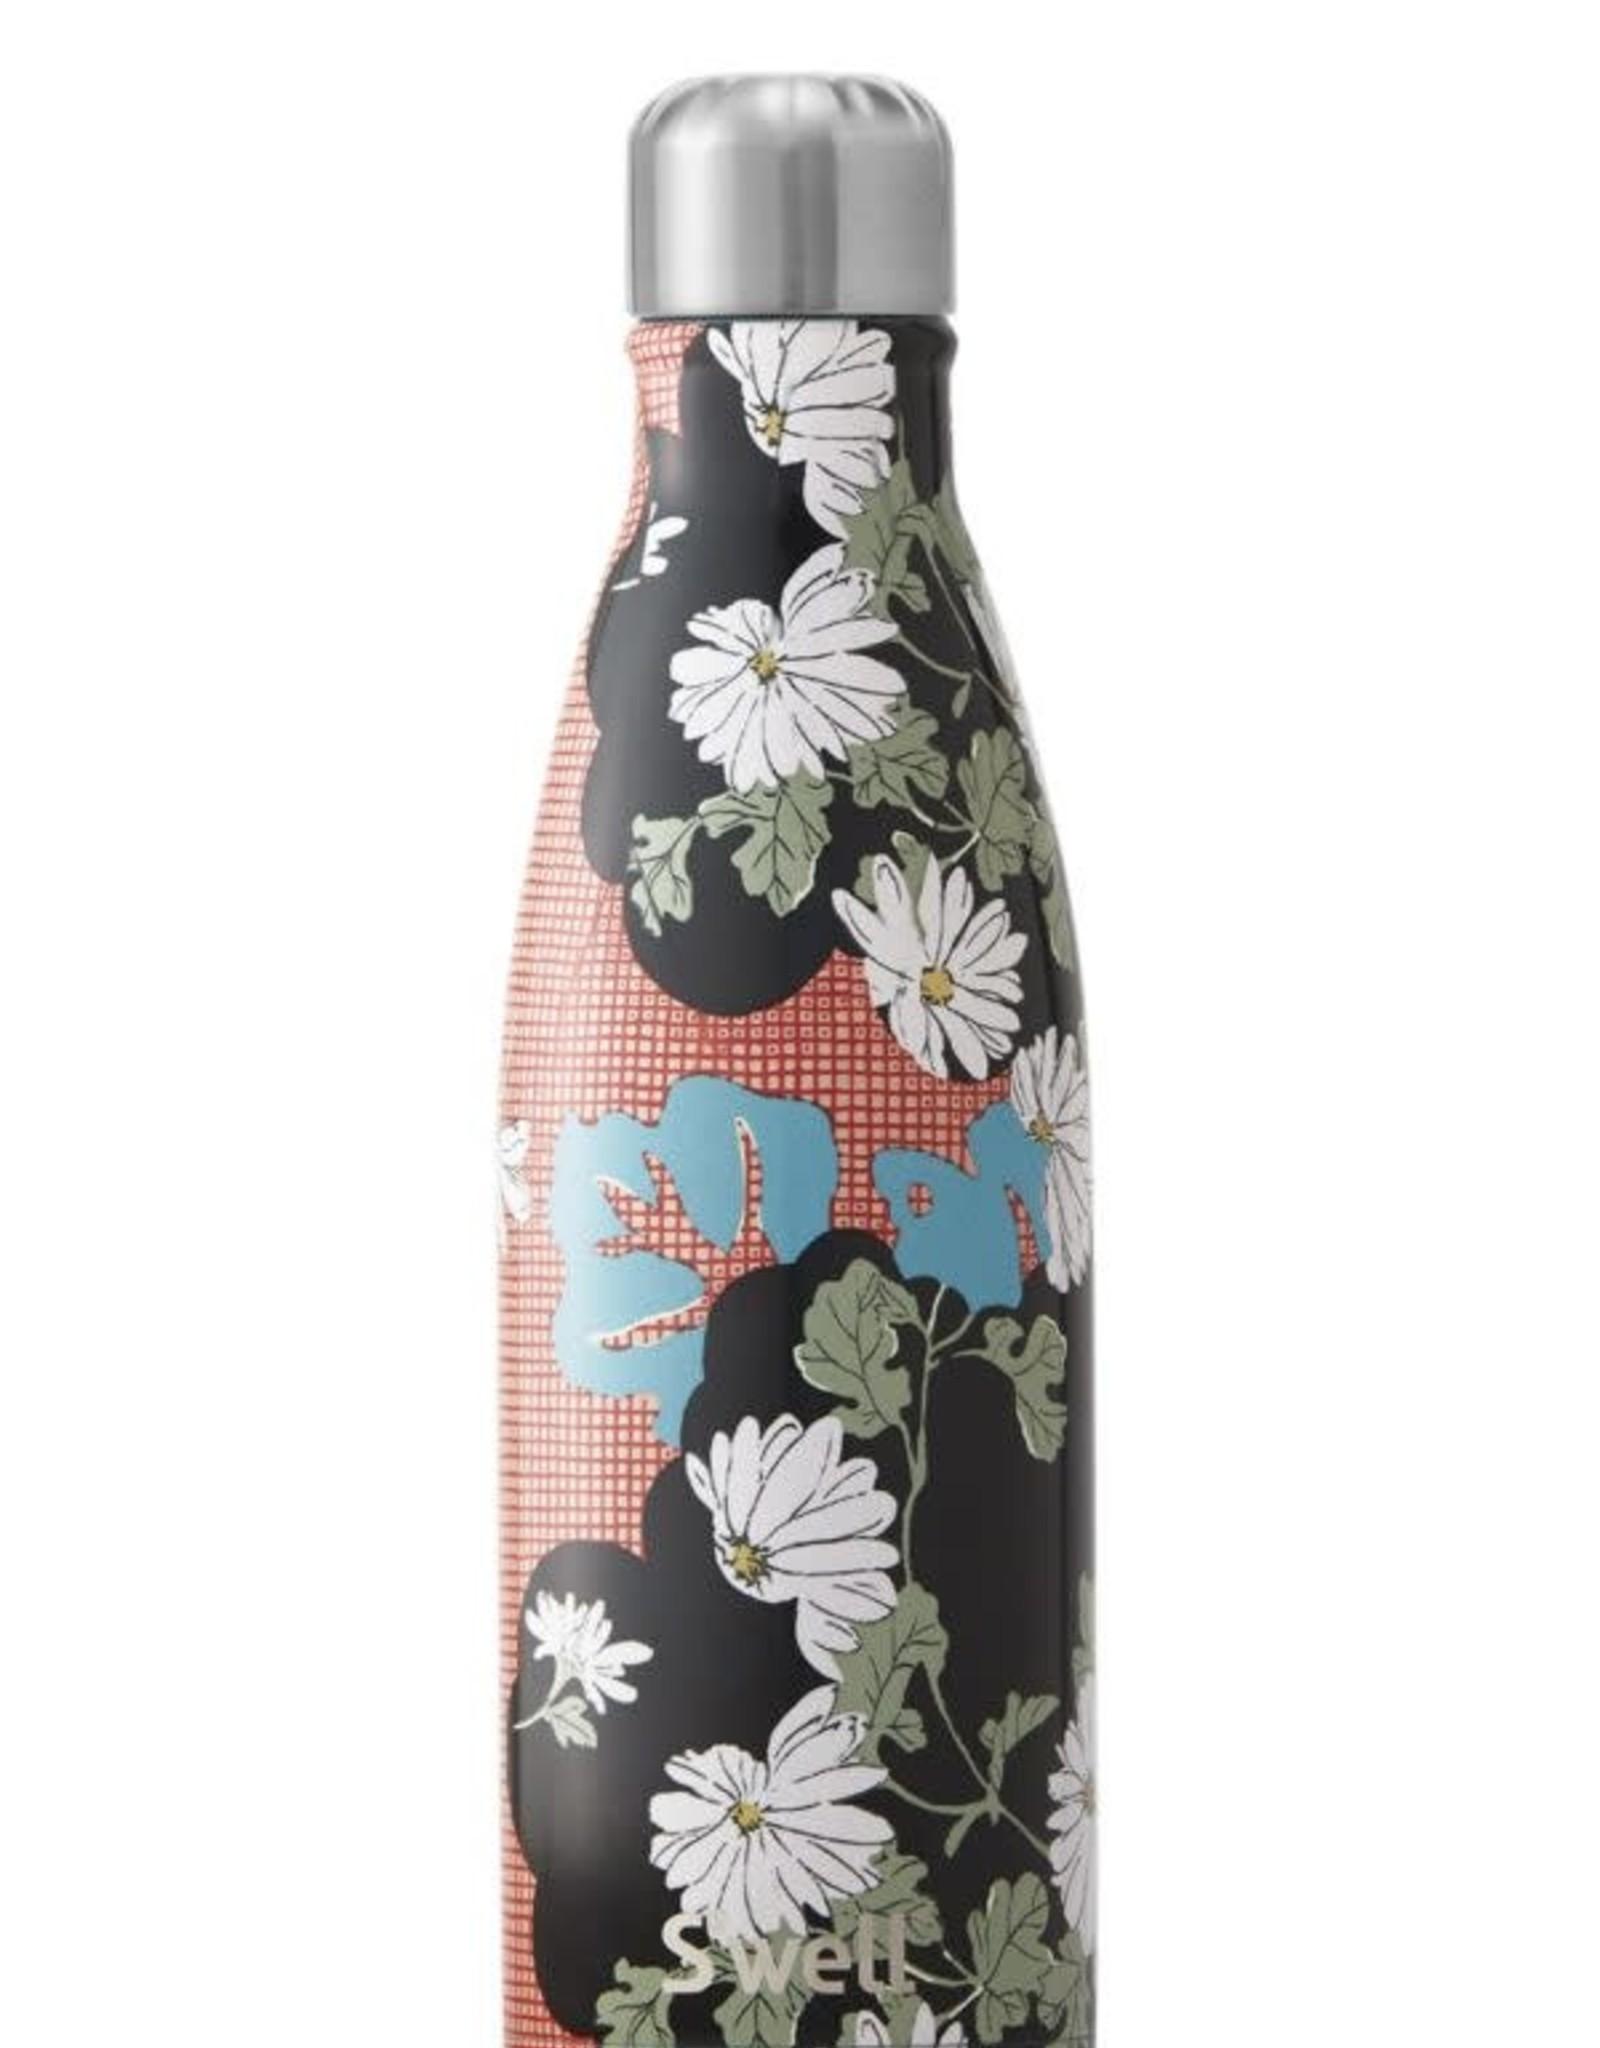 SWELL BOTTLE Liberty London x S'well 17 oz Water Bottle - Tatton Park